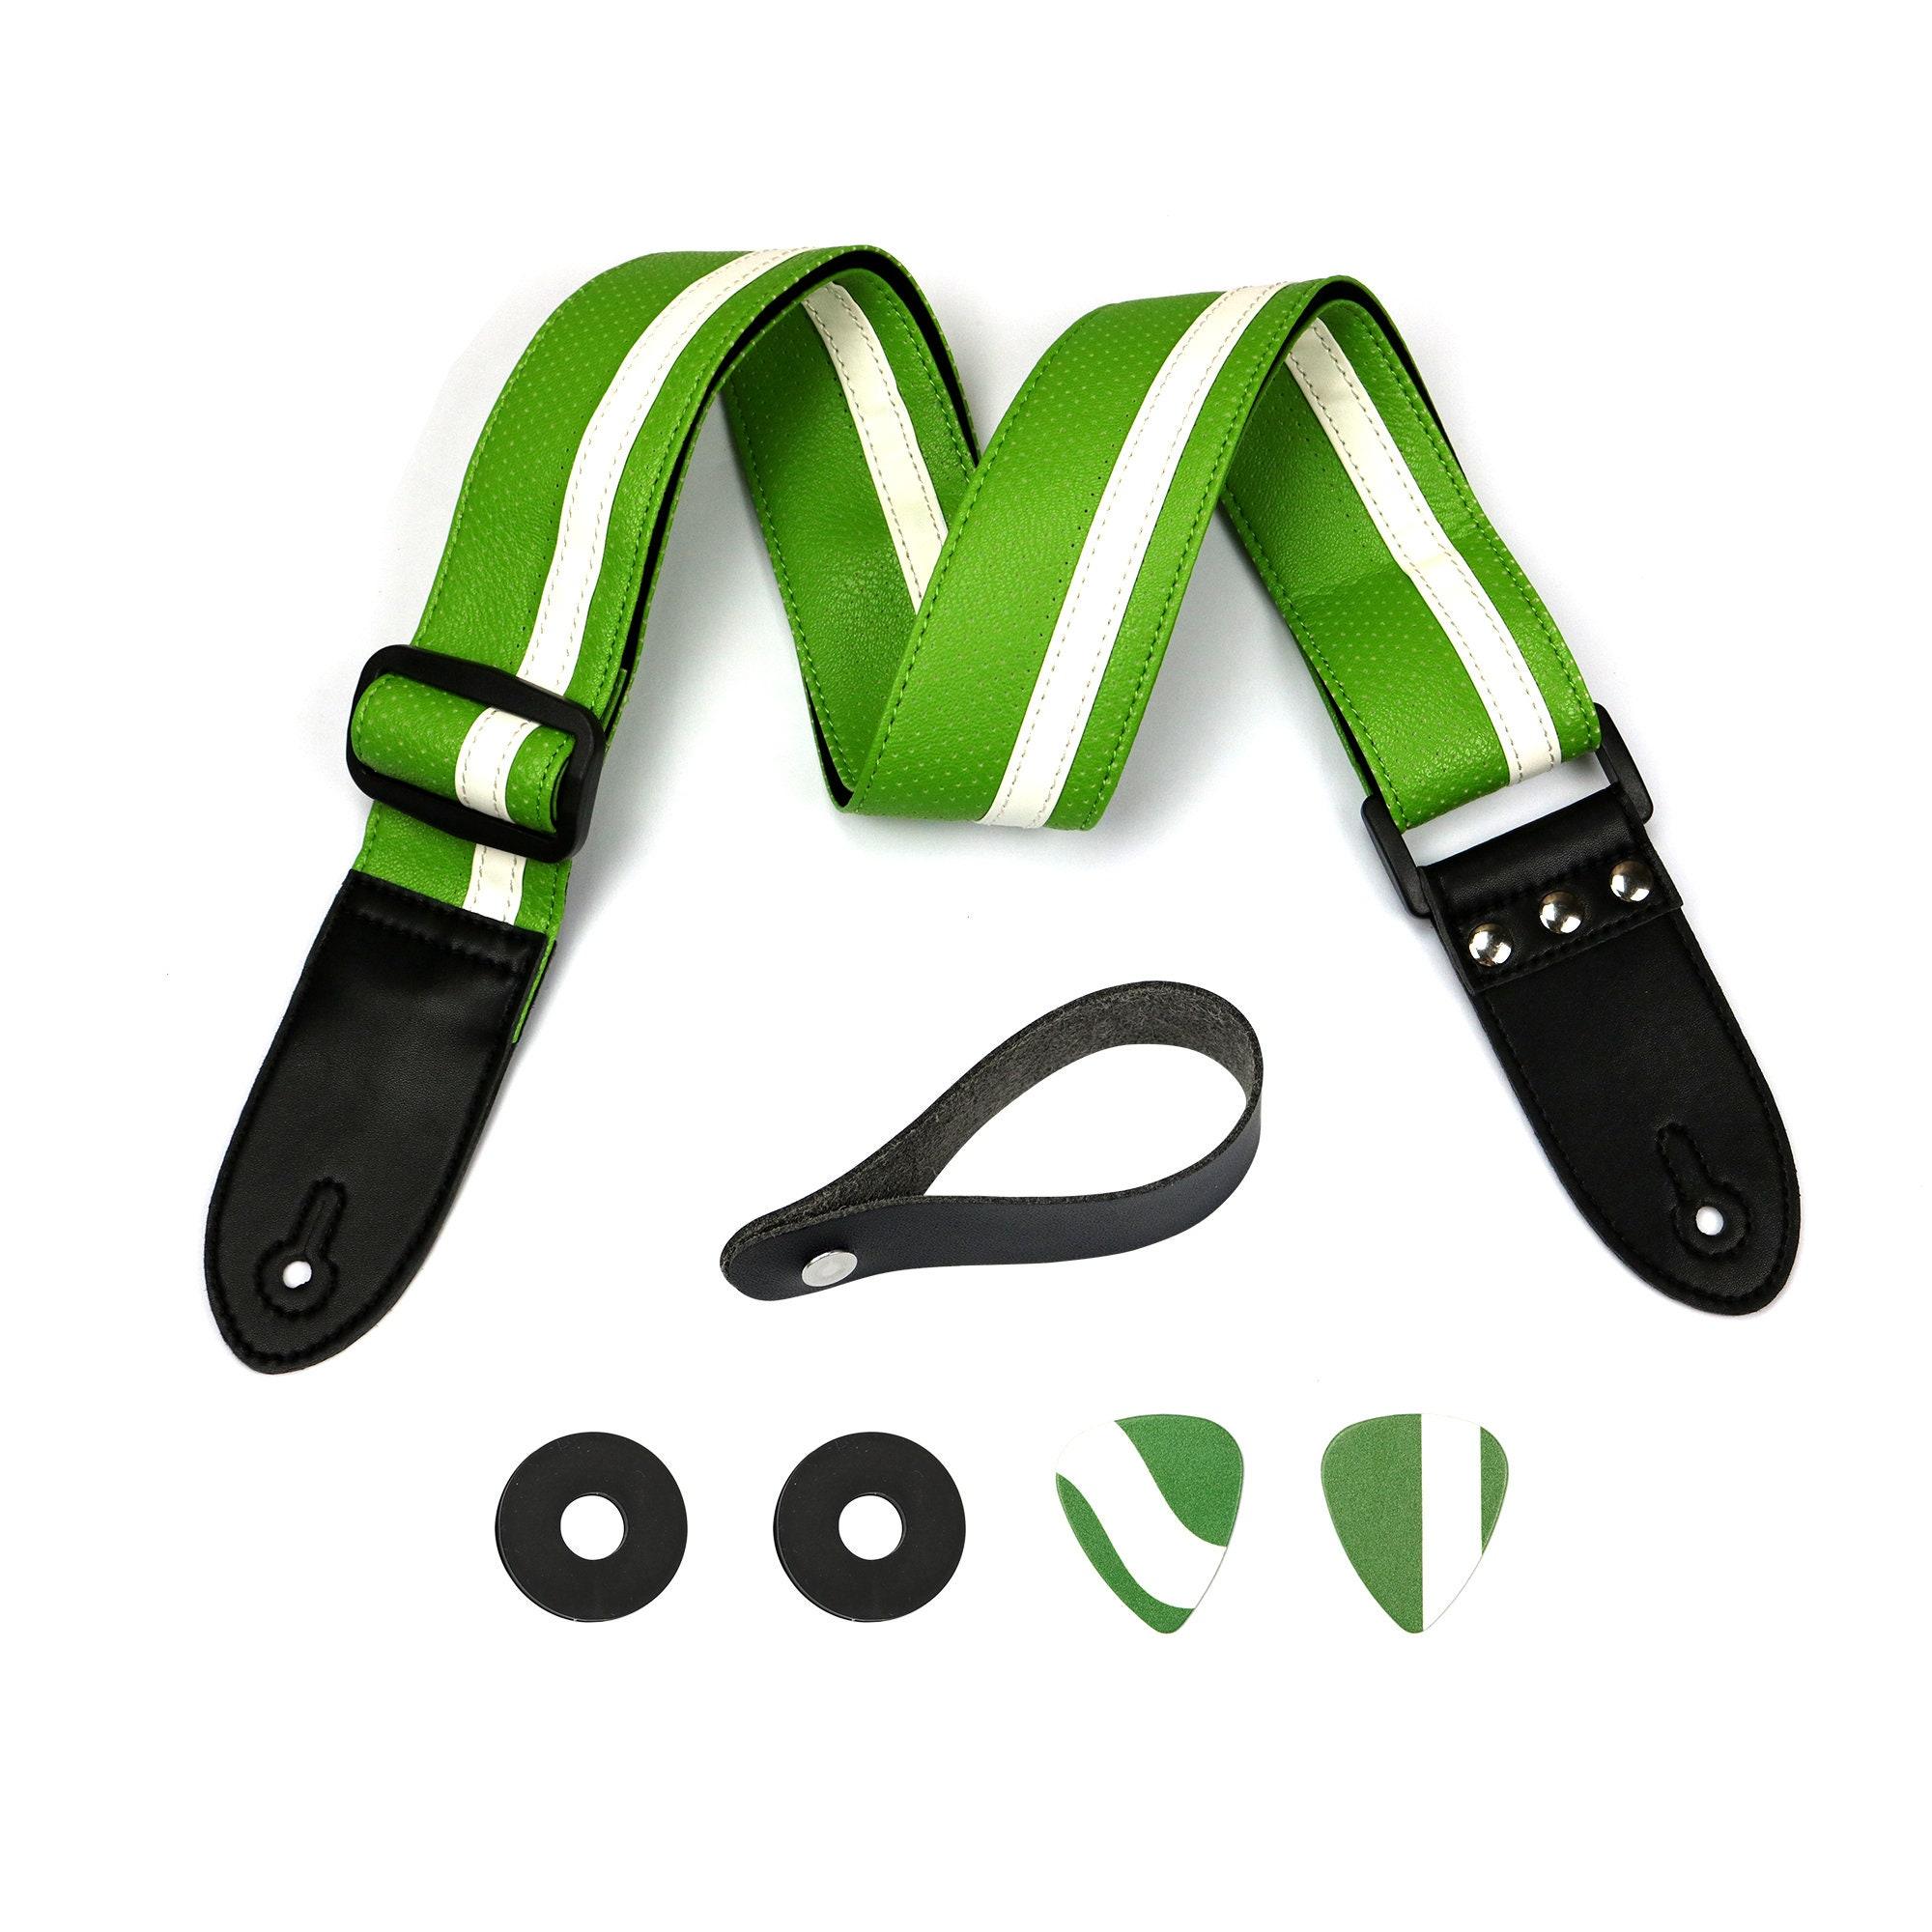 leather guitar strap the green stripe 2 guitar strap etsy. Black Bedroom Furniture Sets. Home Design Ideas